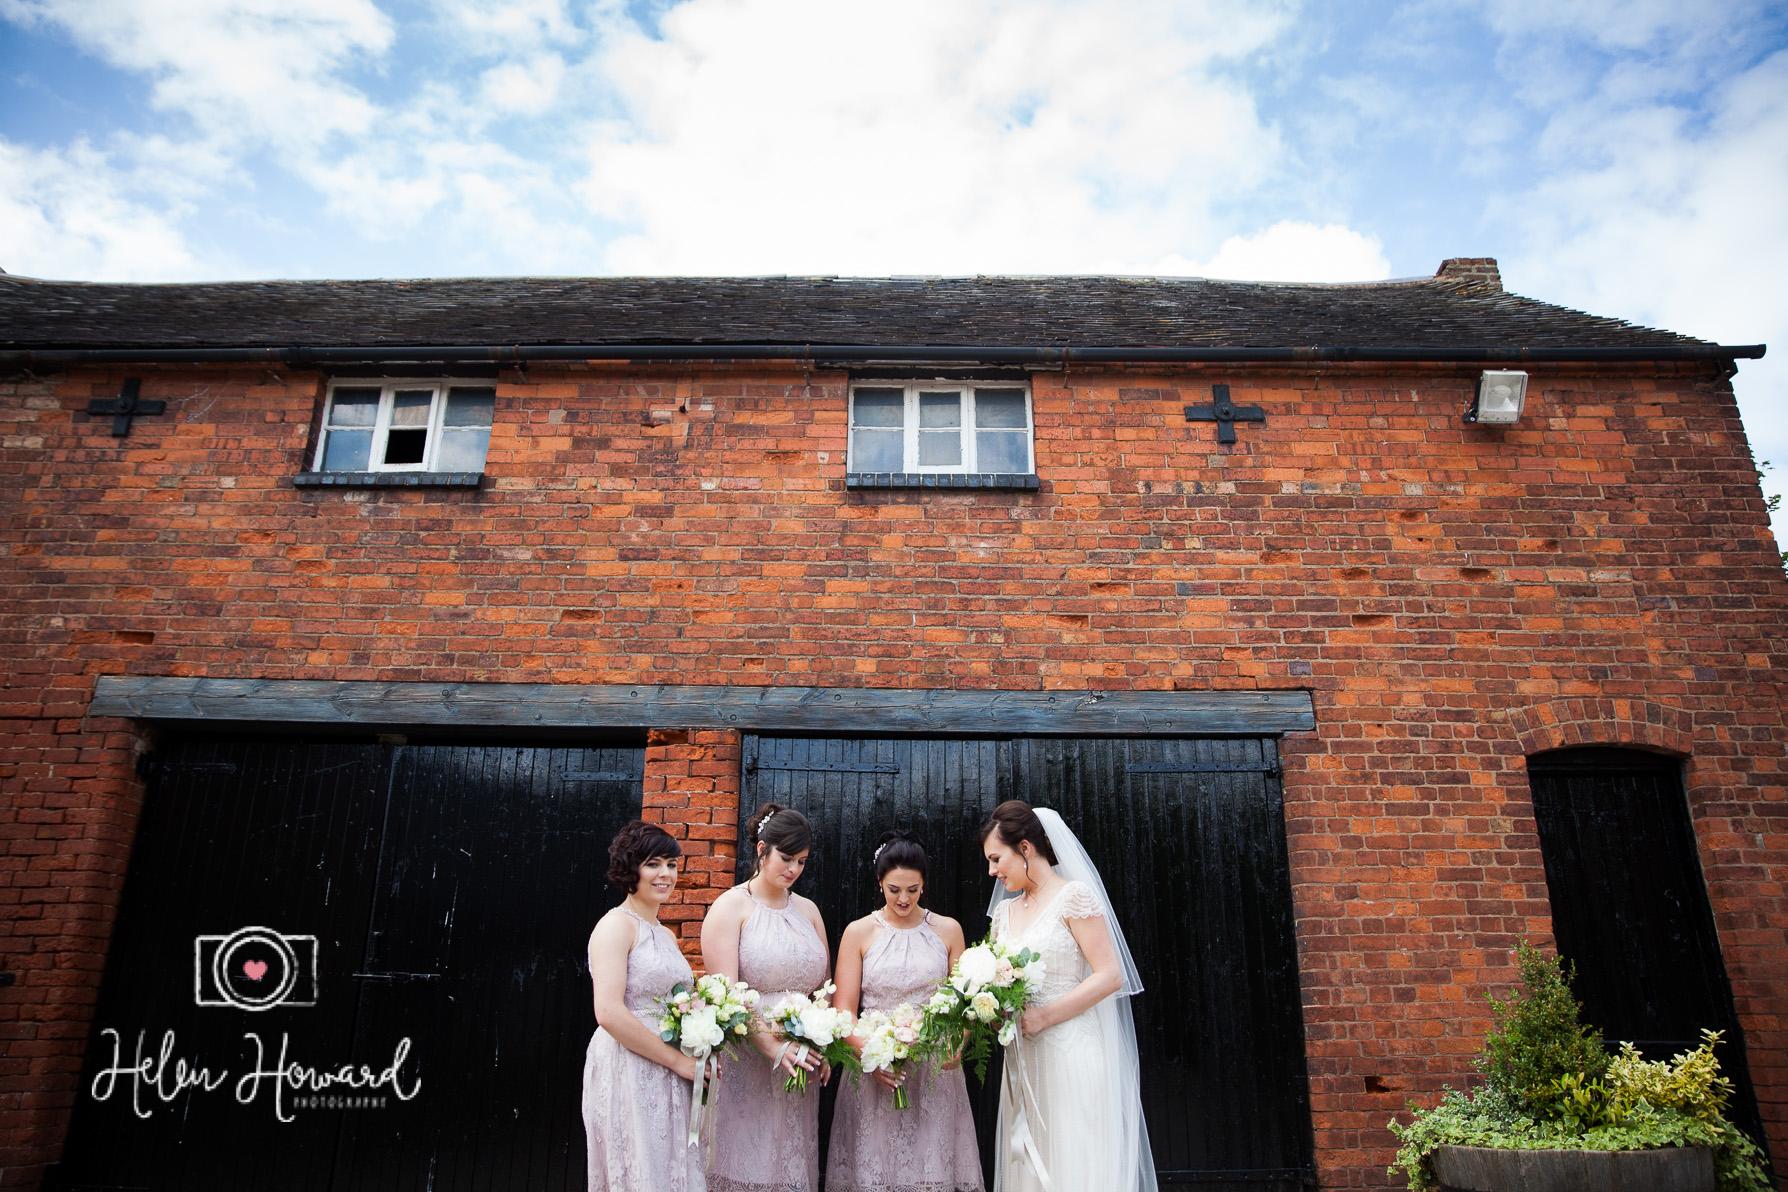 Helen Howard Photography Packington Moor Wedding-73.jpg